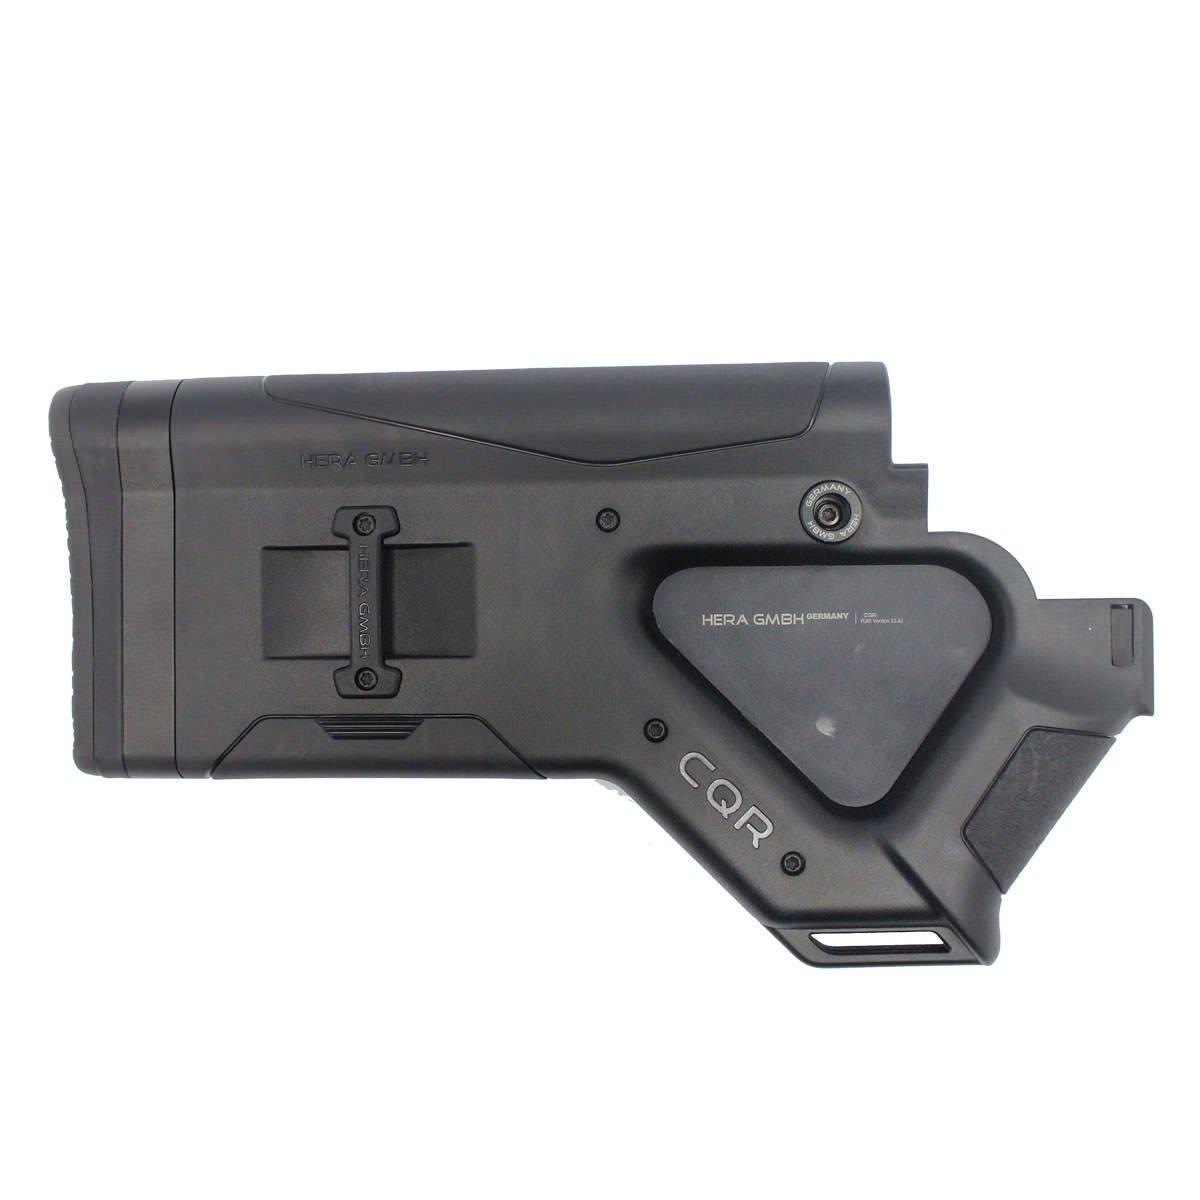 HERA Cqr Buttstock Black Ca Version Stock Accessories